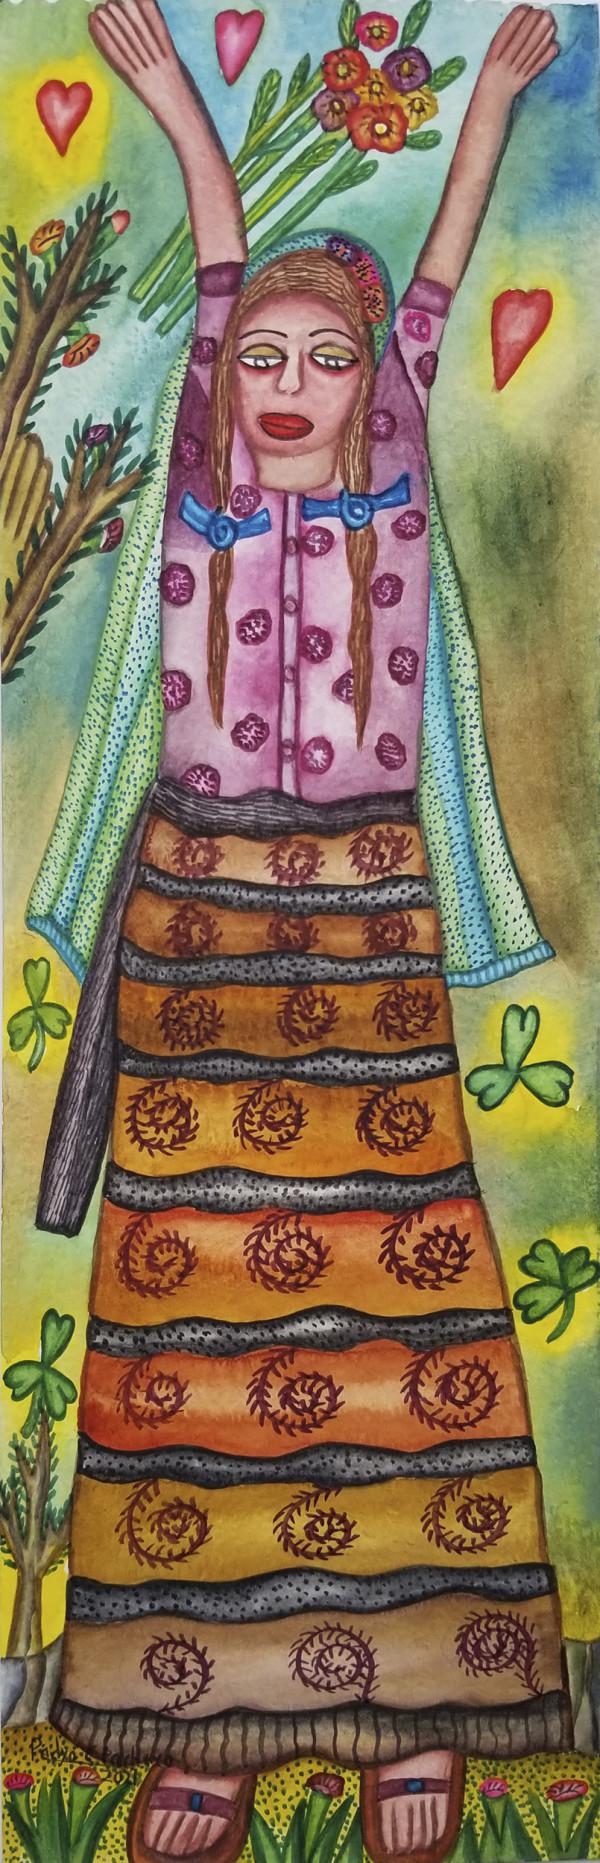 Mujer de Amor / Woman of Love by Pedro Cruz Pacheco